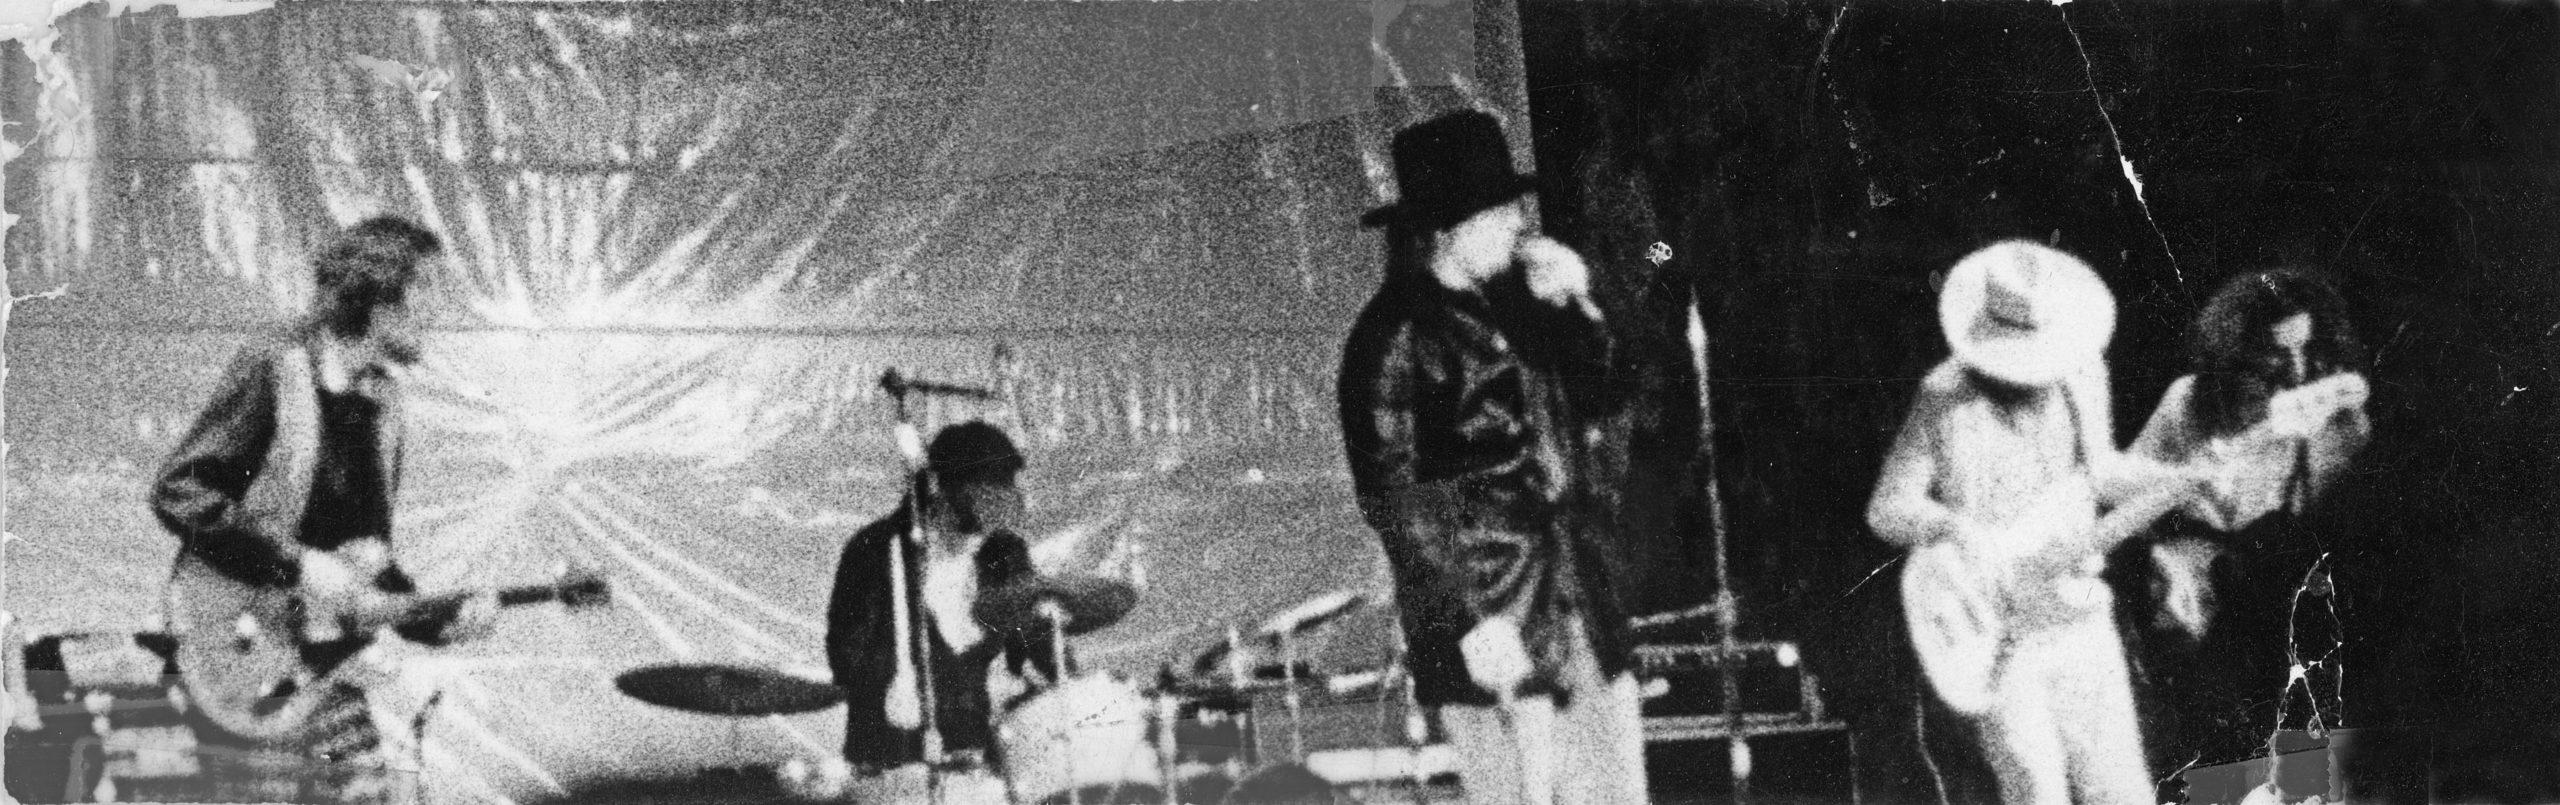 Kim Torgerson photo of Captain Beefheart and His Magic Band at Carolina Coliseum, Columbus, Ohio October 19, 1972